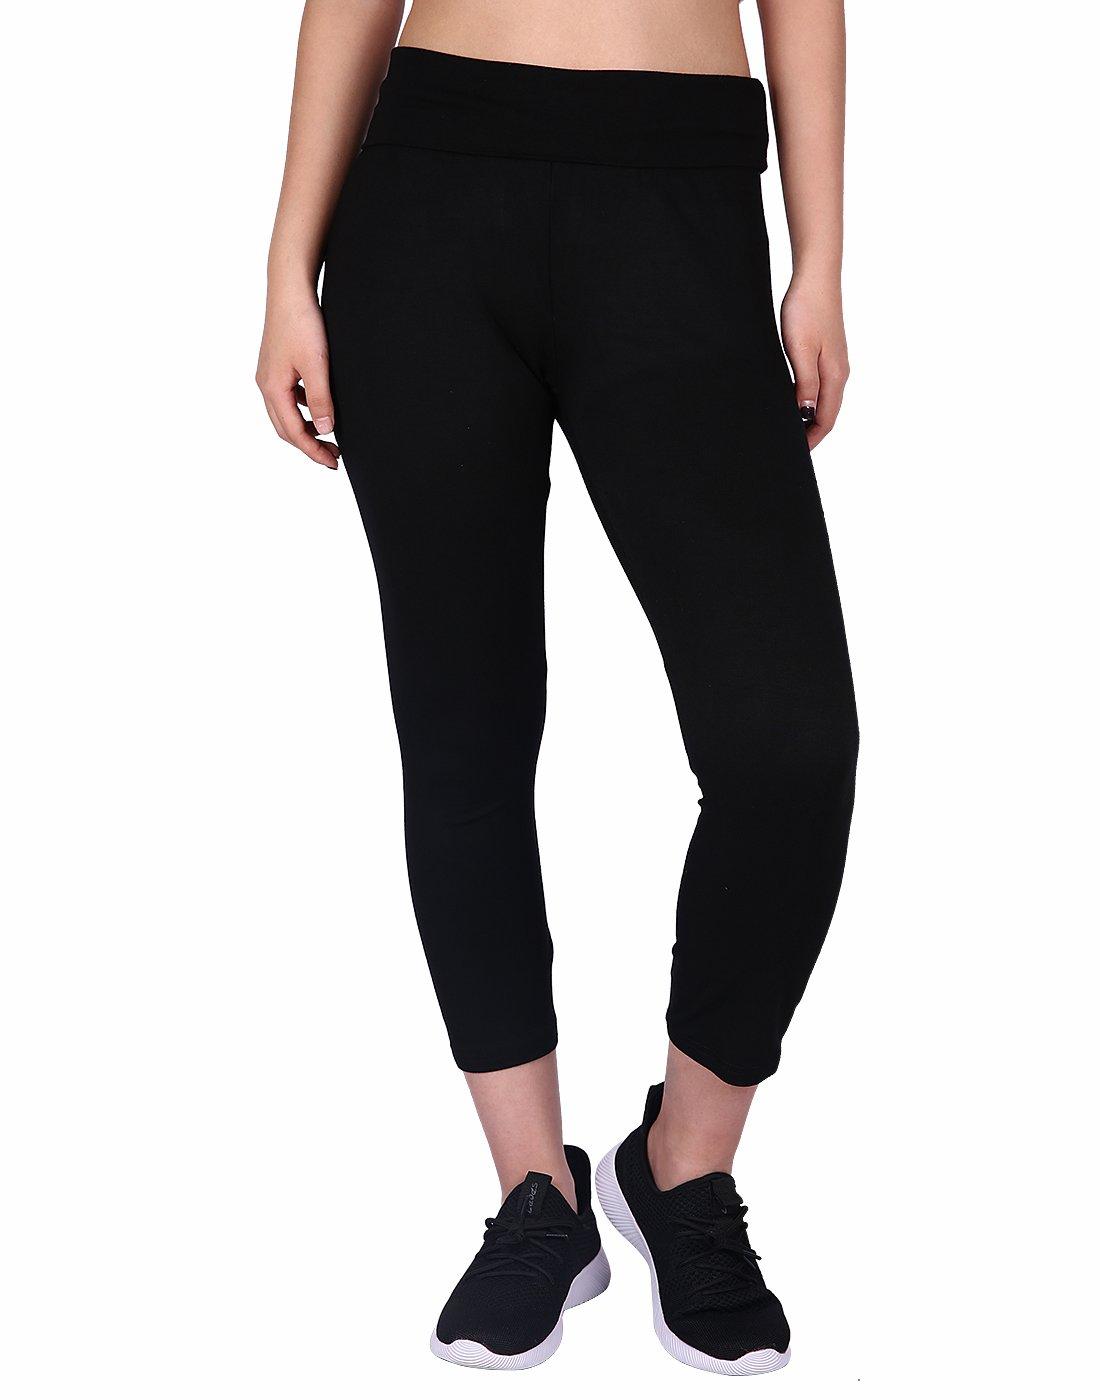 HDE Women's Yoga Capri Pants Color Block Fold Over Waist Workout Leggings (Black, X-Large)